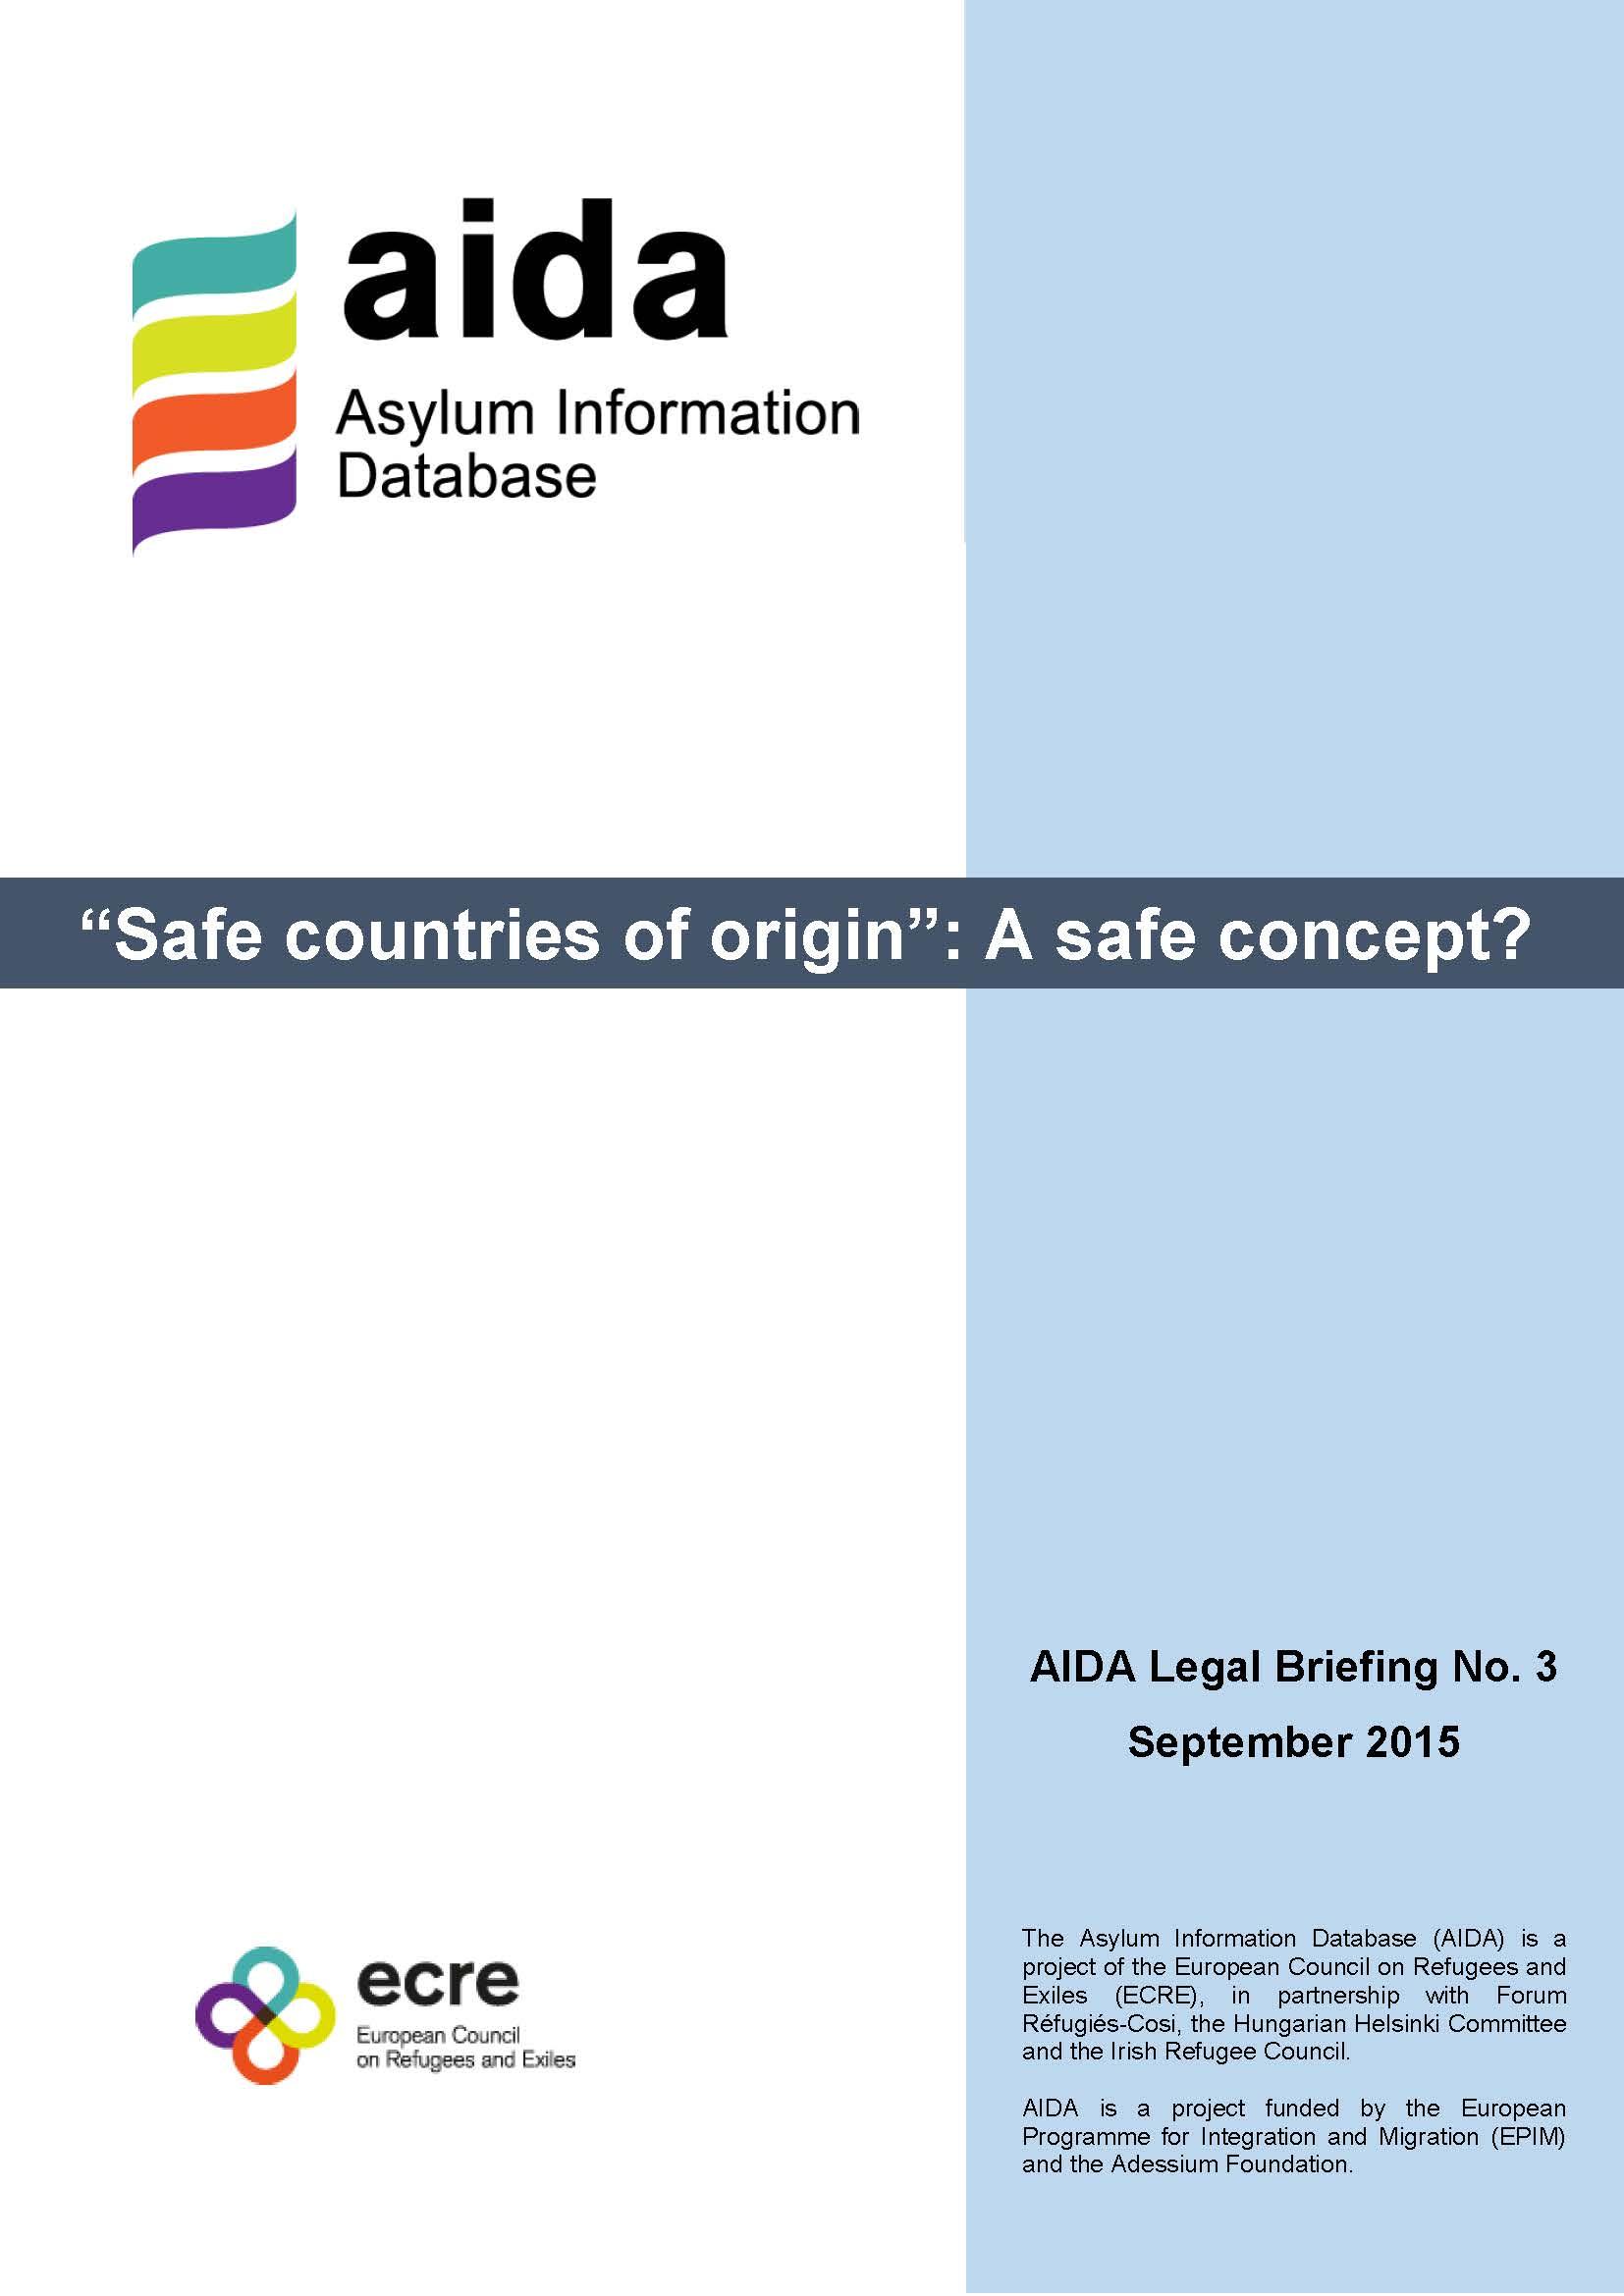 AIDA_Legal Briefing_Safe Country of Origin_9_2015